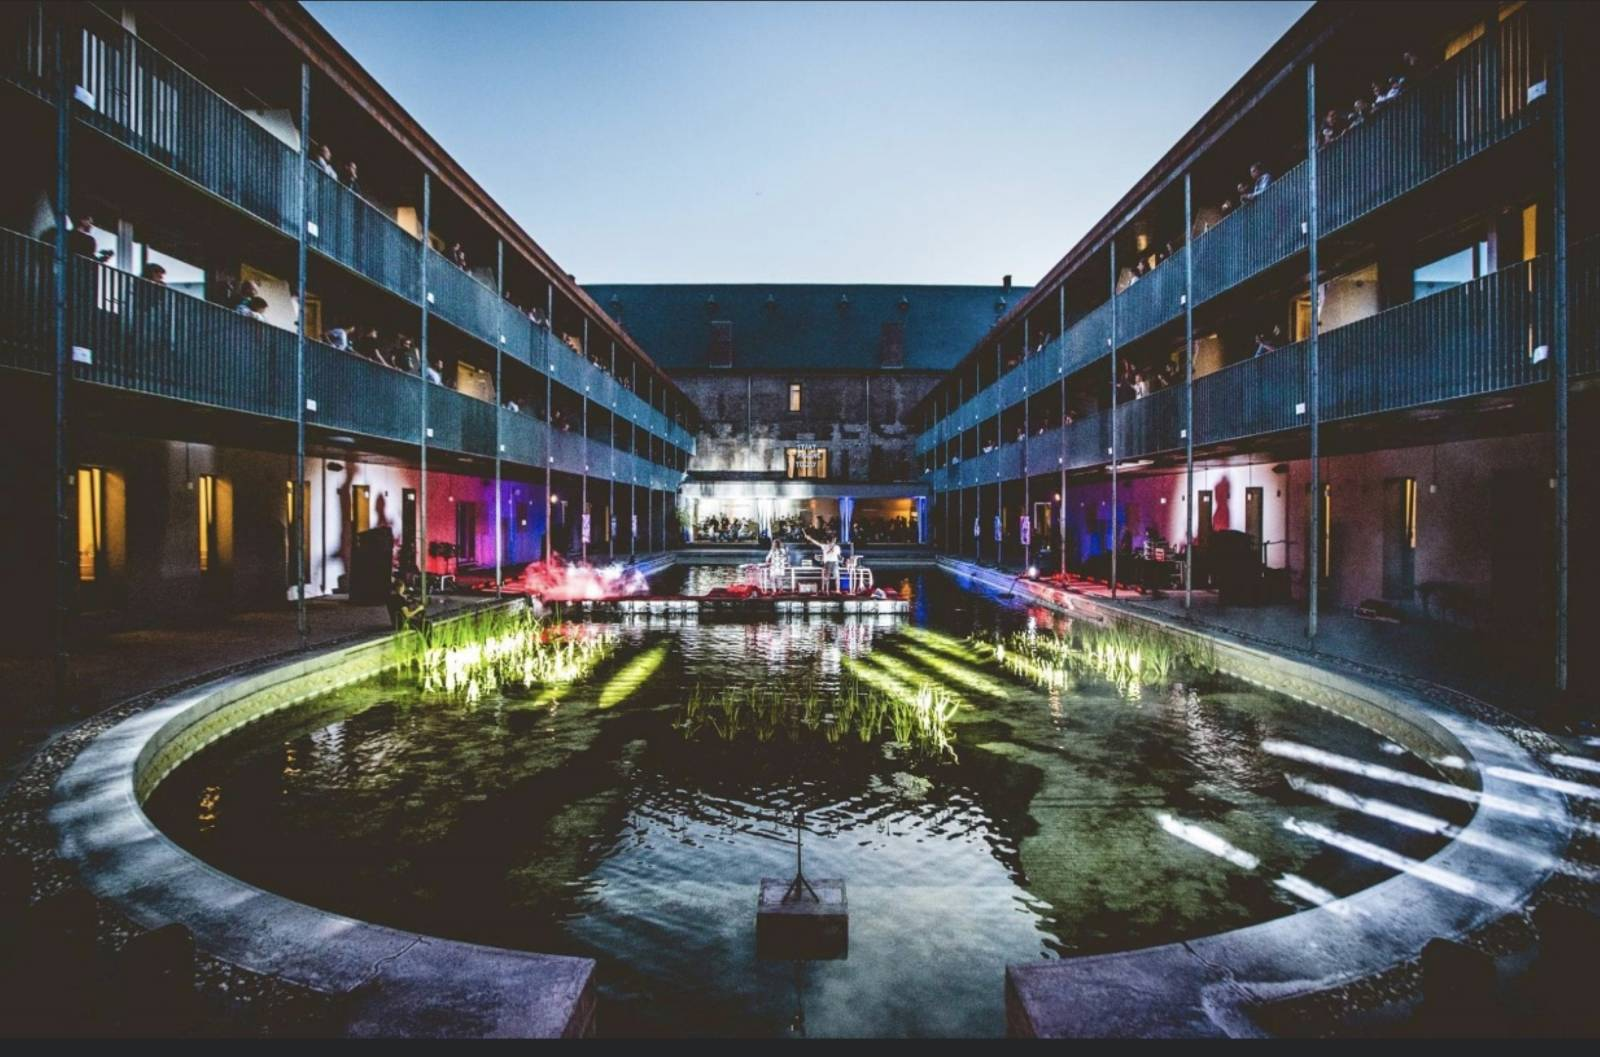 Feestal - Van der Valk hotel Mechelen - House of Weddings (20)